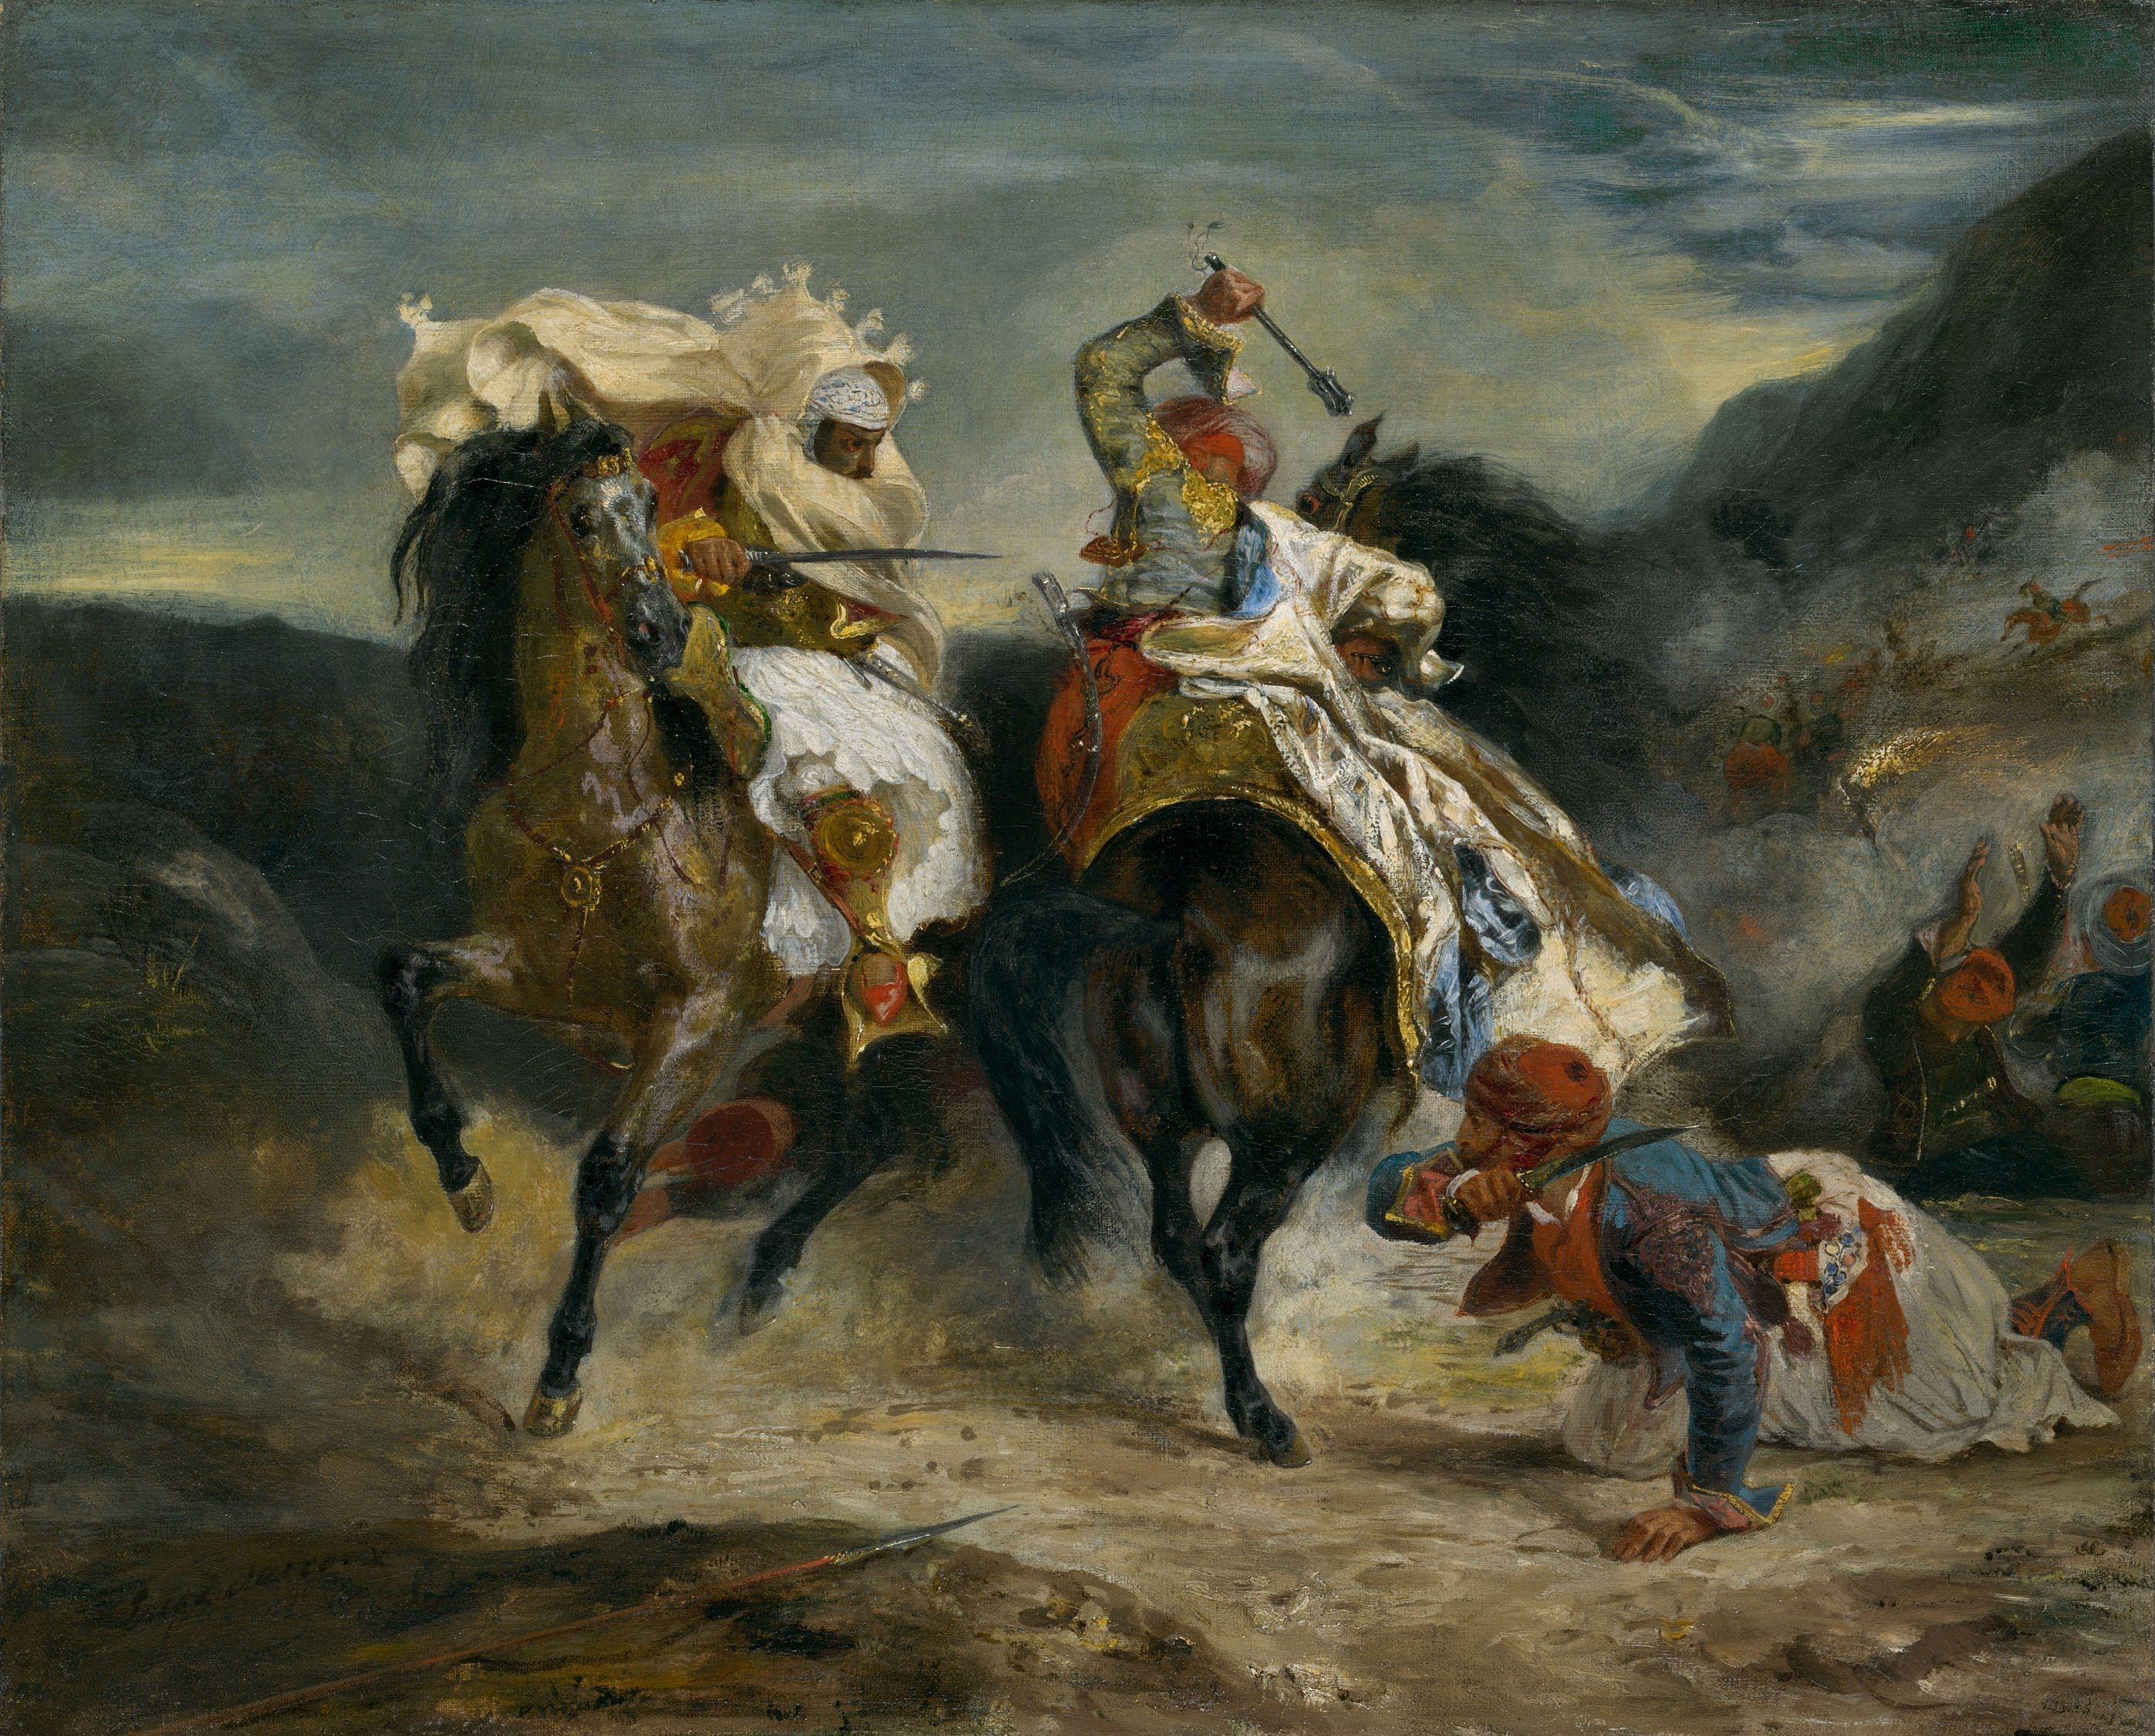 https://upload.wikimedia.org/wikipedia/commons/c/c8/Eug%C3%A8ne_Ferdinand_Victor_Delacroix_021.jpg